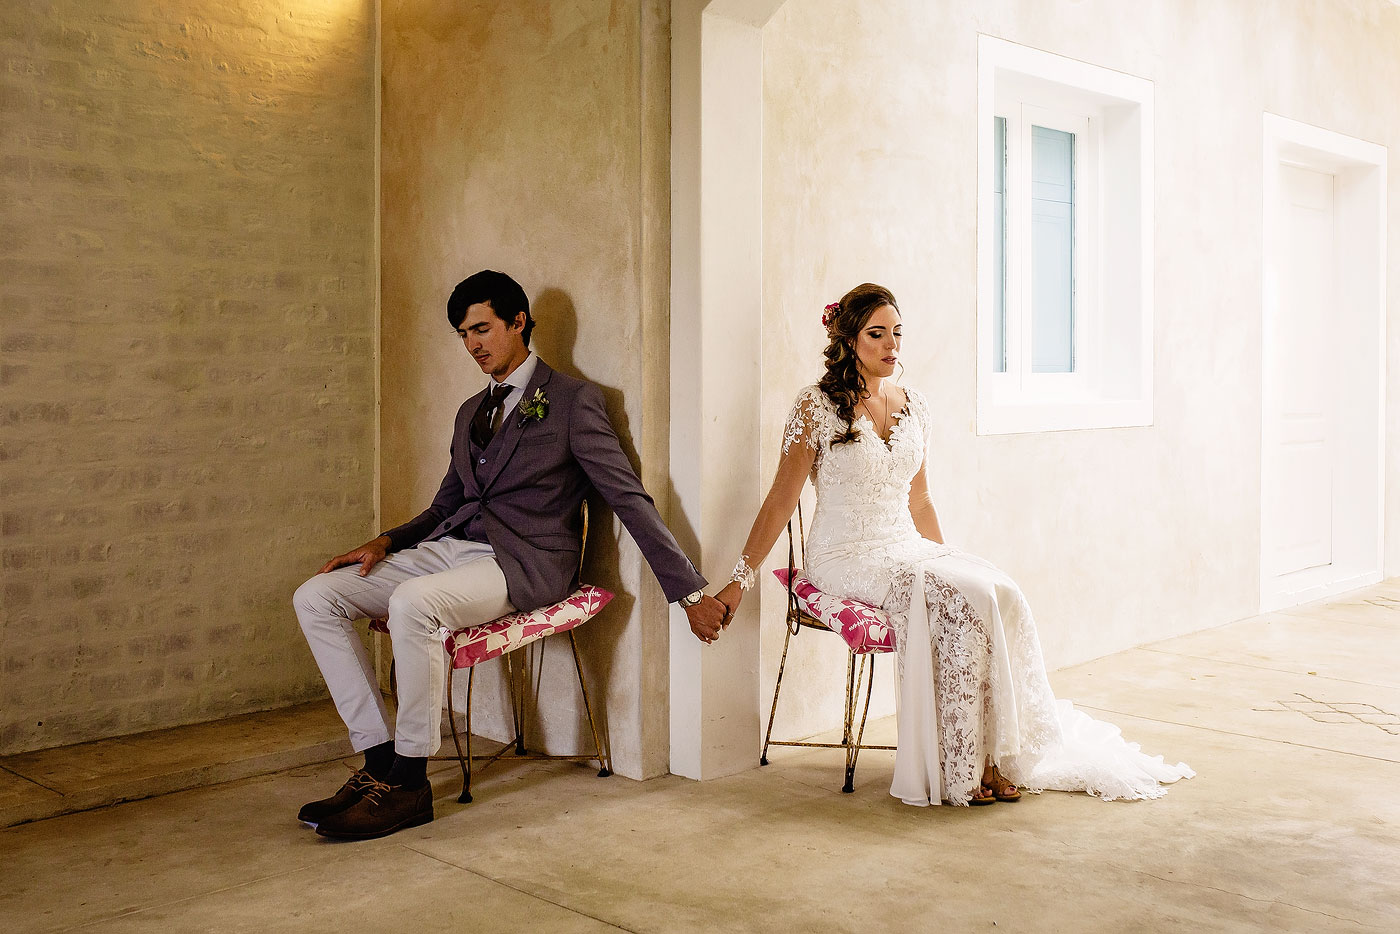 Bride and Groom wedding prayers